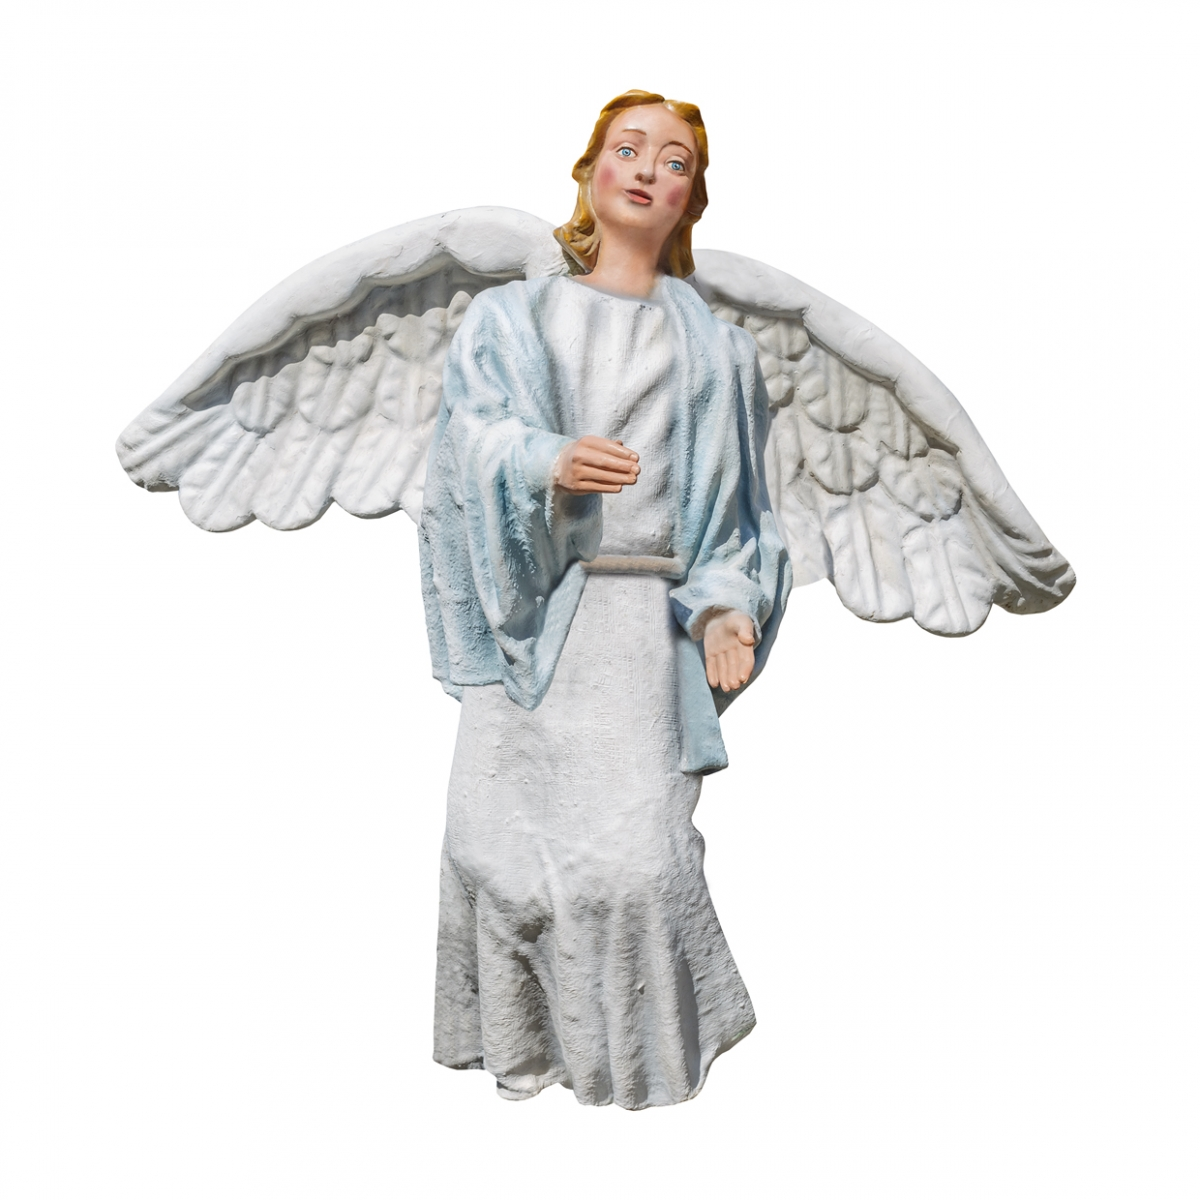 Imagen en la que se ve un ángel